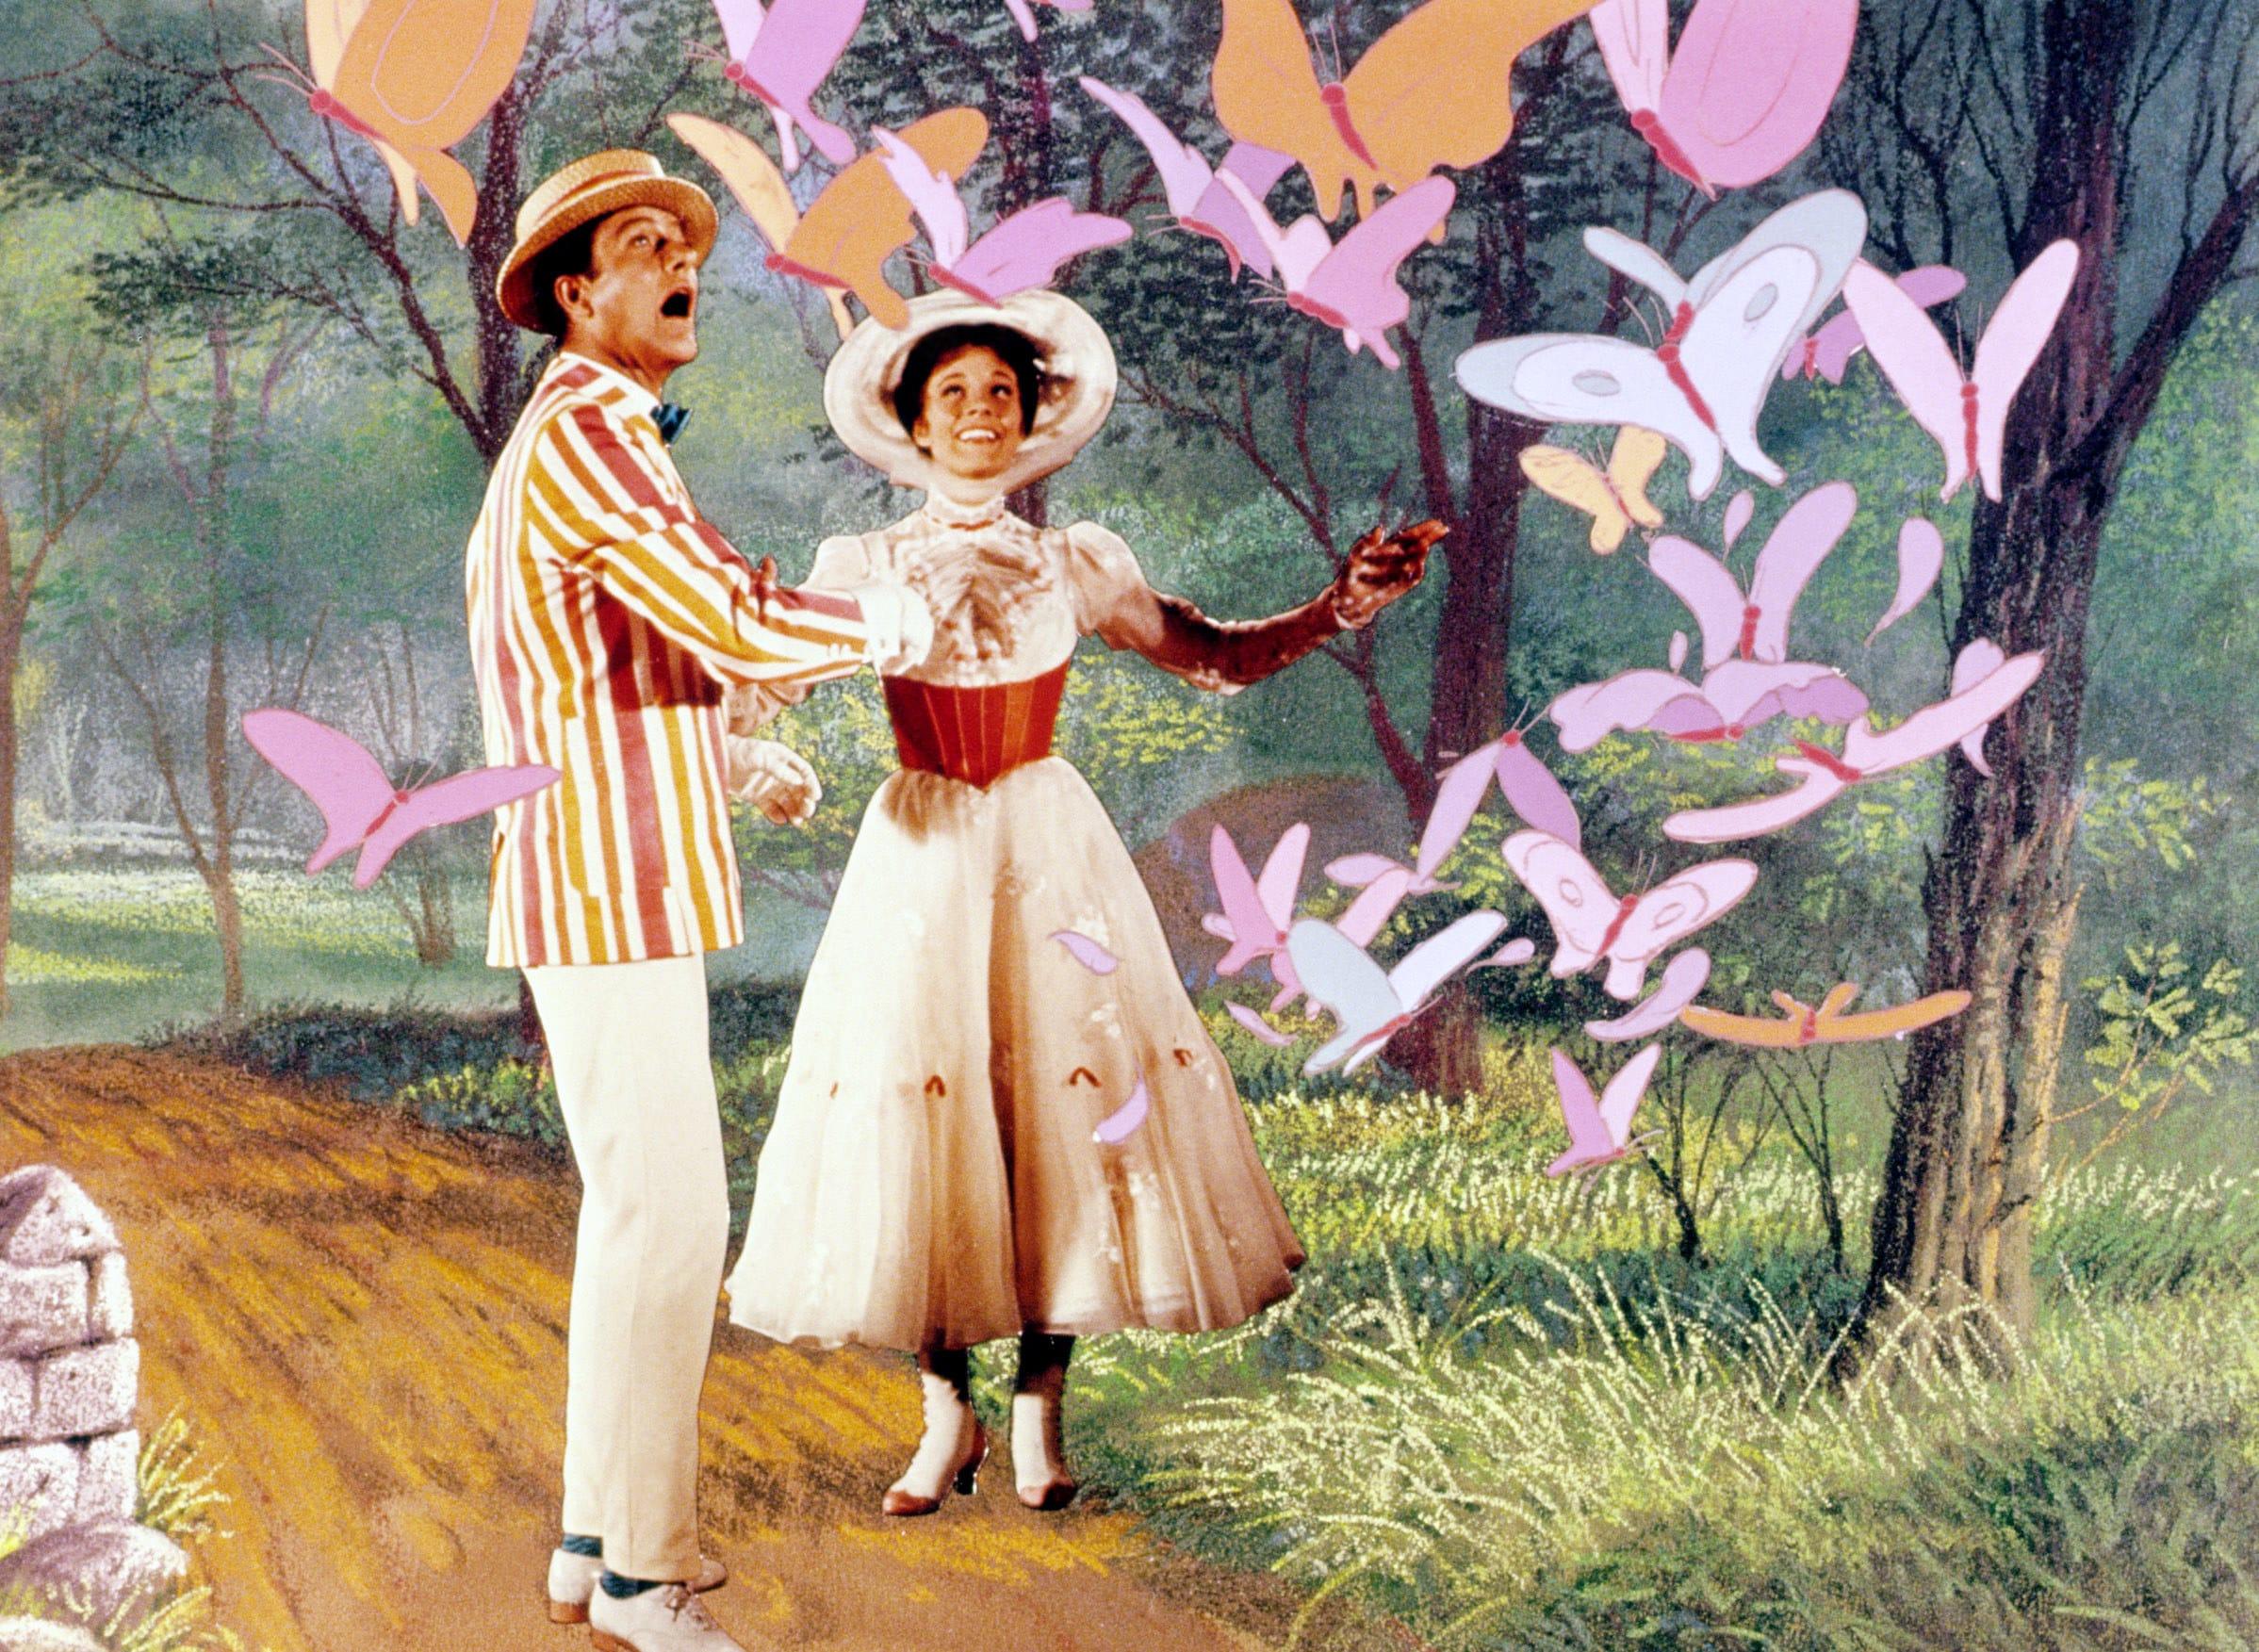 Burt and Mary Poppins